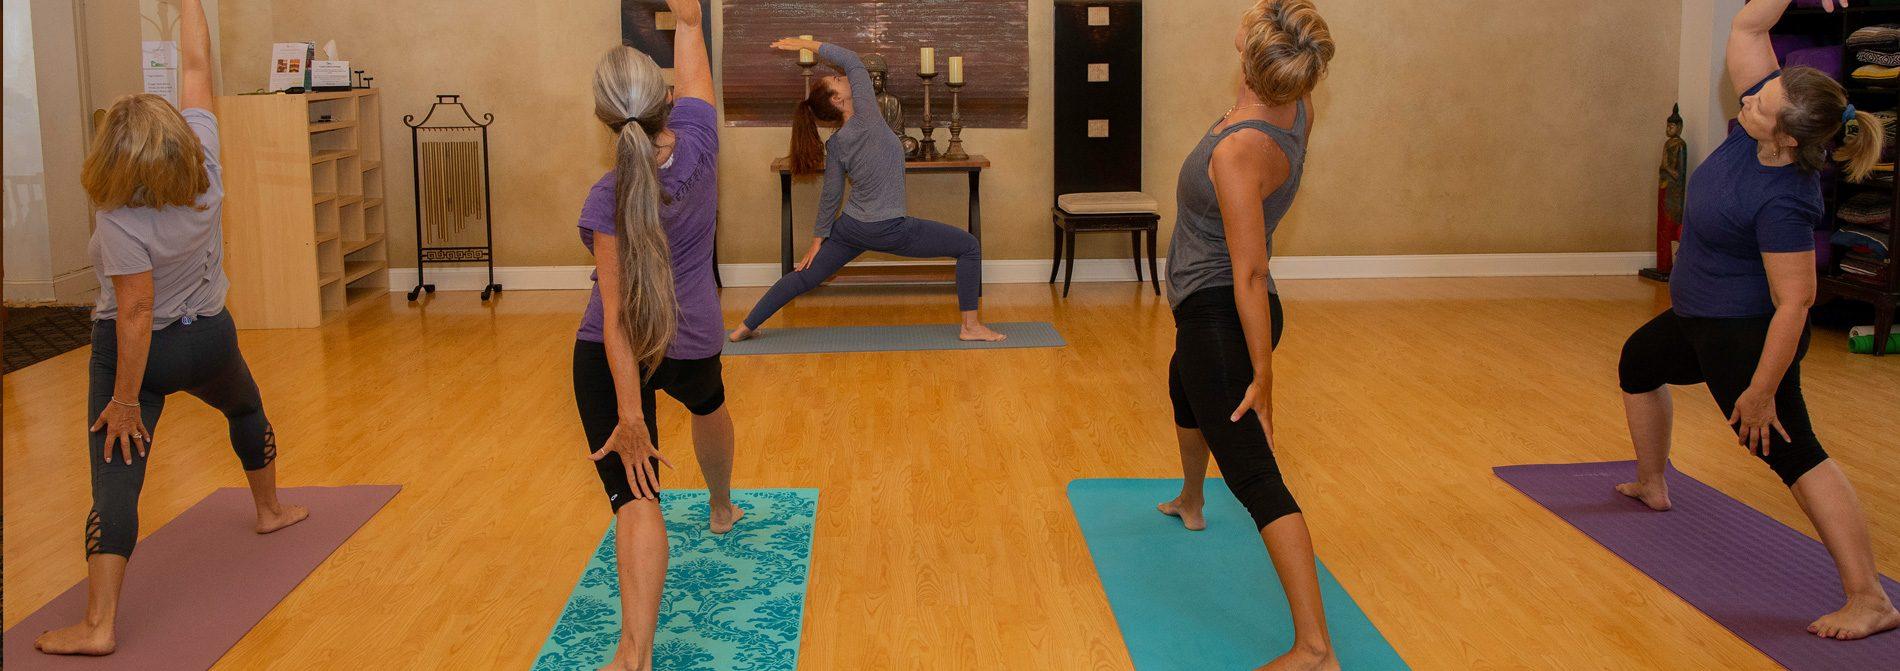 Yoga Fitness Professionals Yoga Class Studio Milford Ct